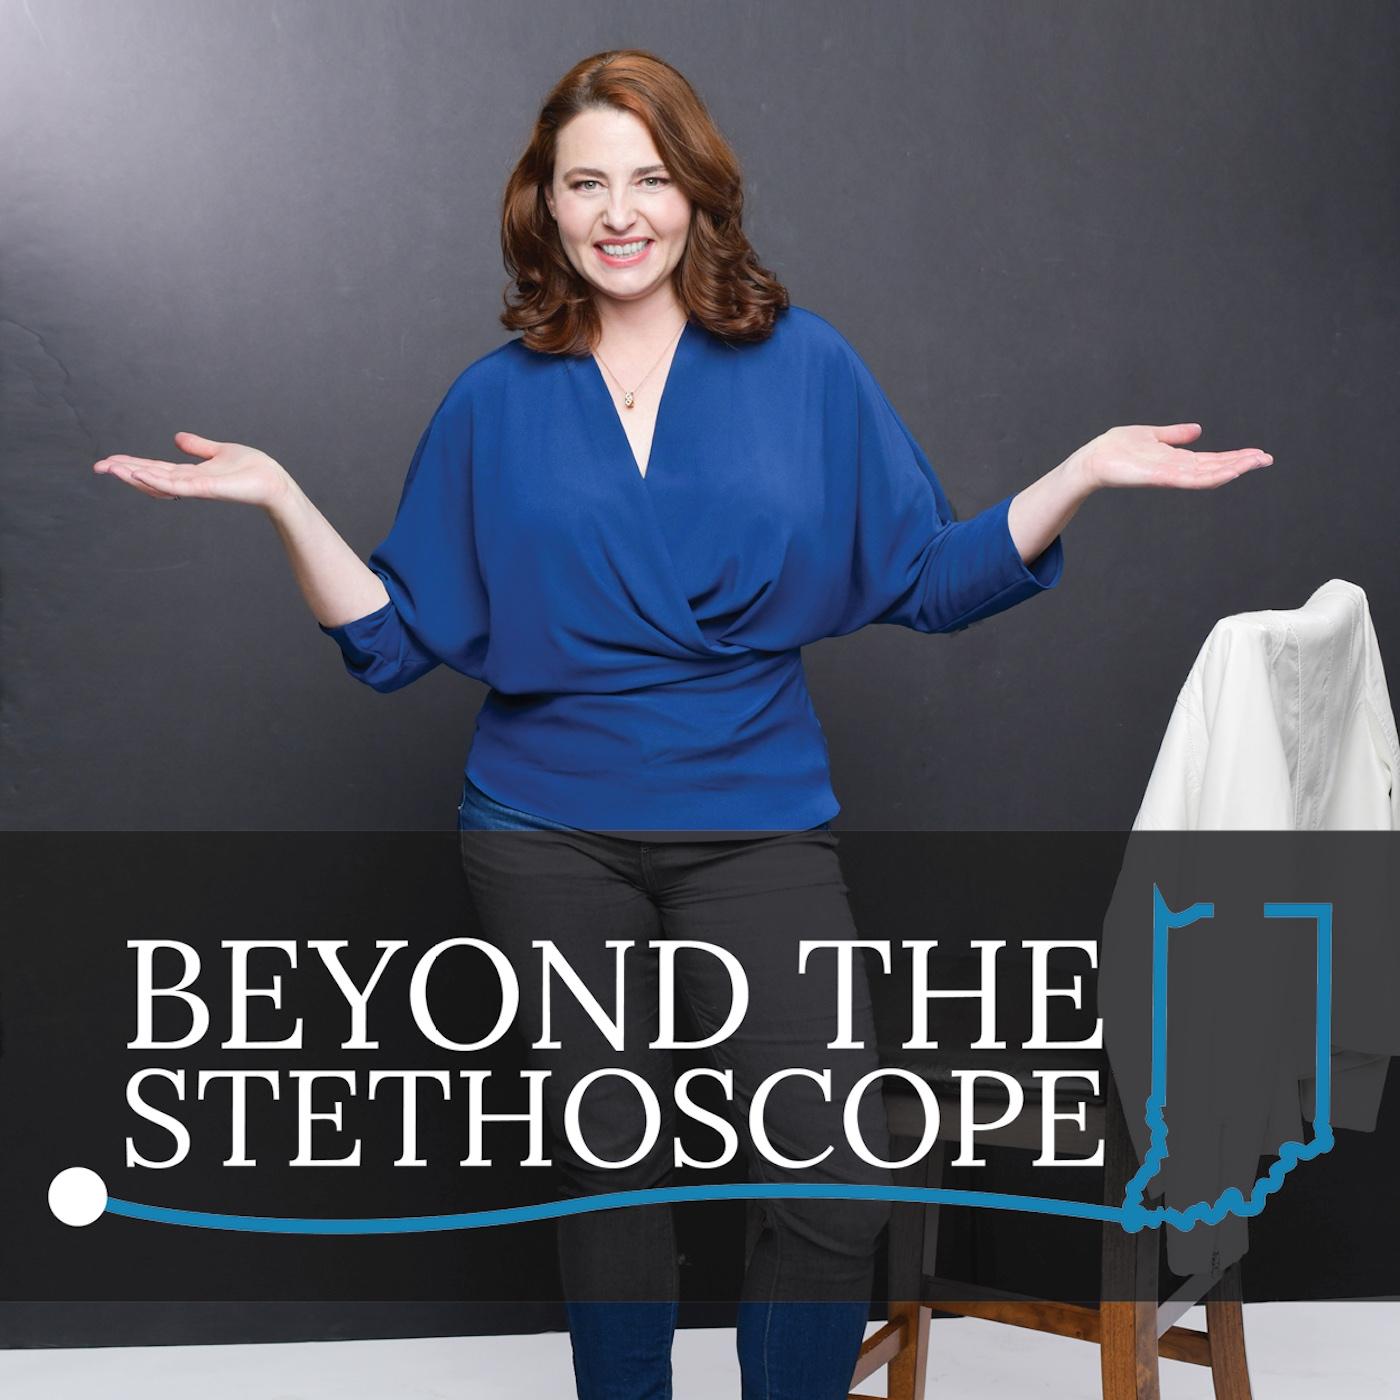 Beyond The Stethoscope show art